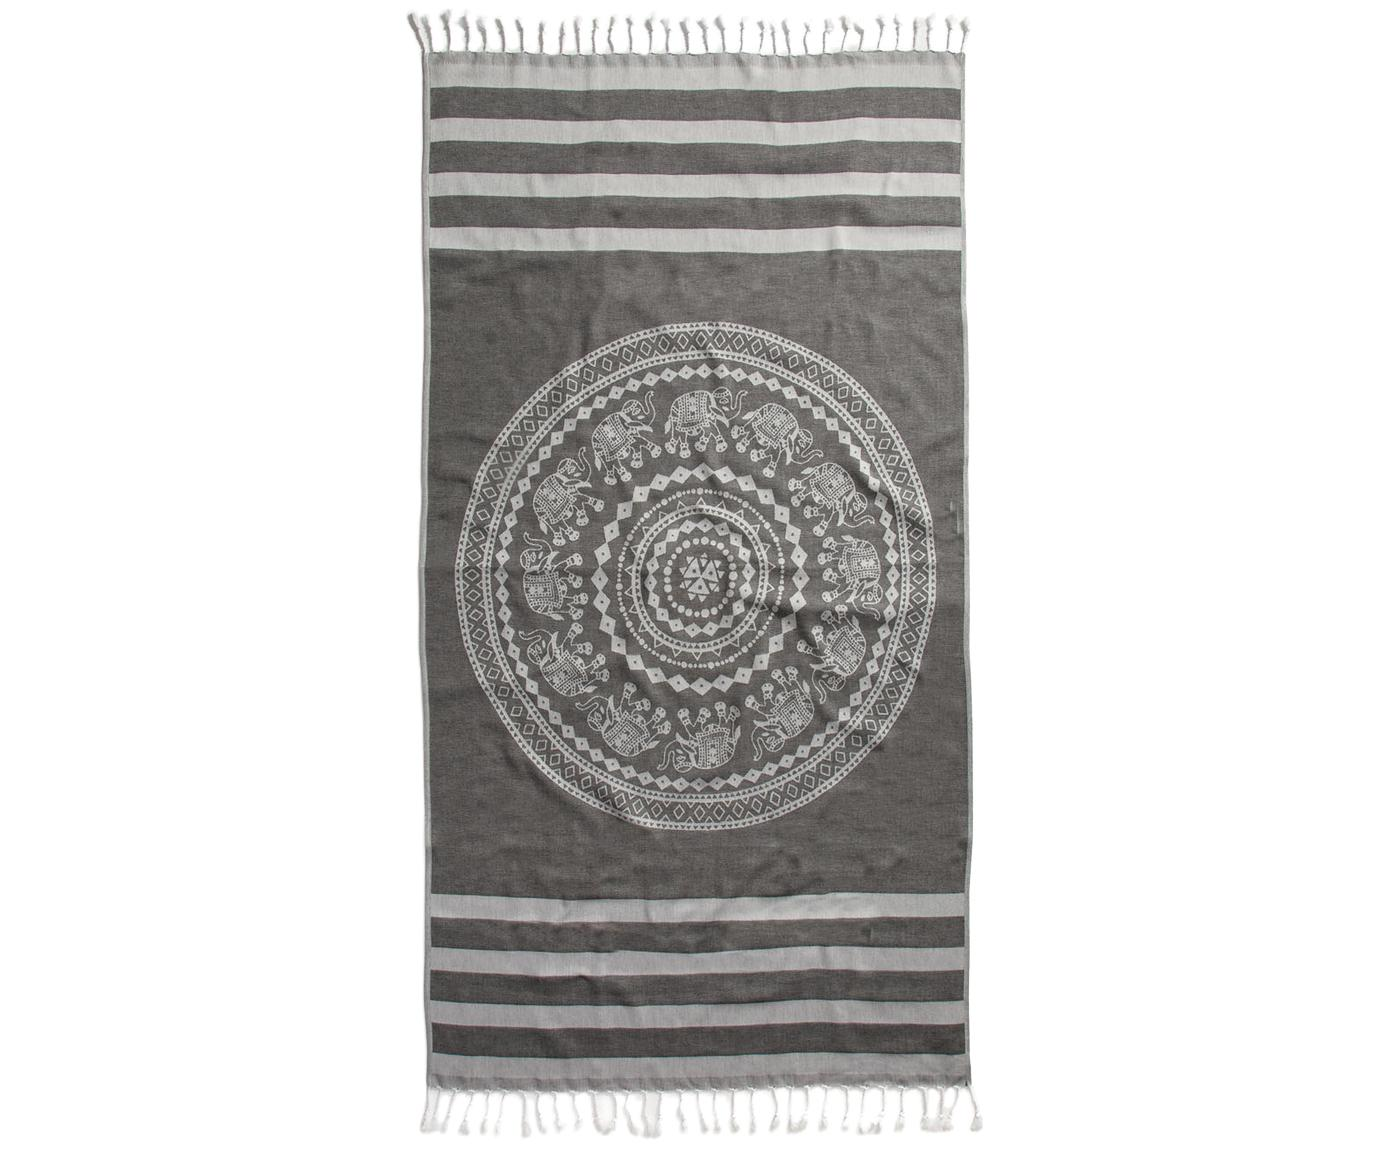 Fouta Shiva, Algodón Gramaje ligero, 210g/m², Negro, gris, An 90 x L 180 cm